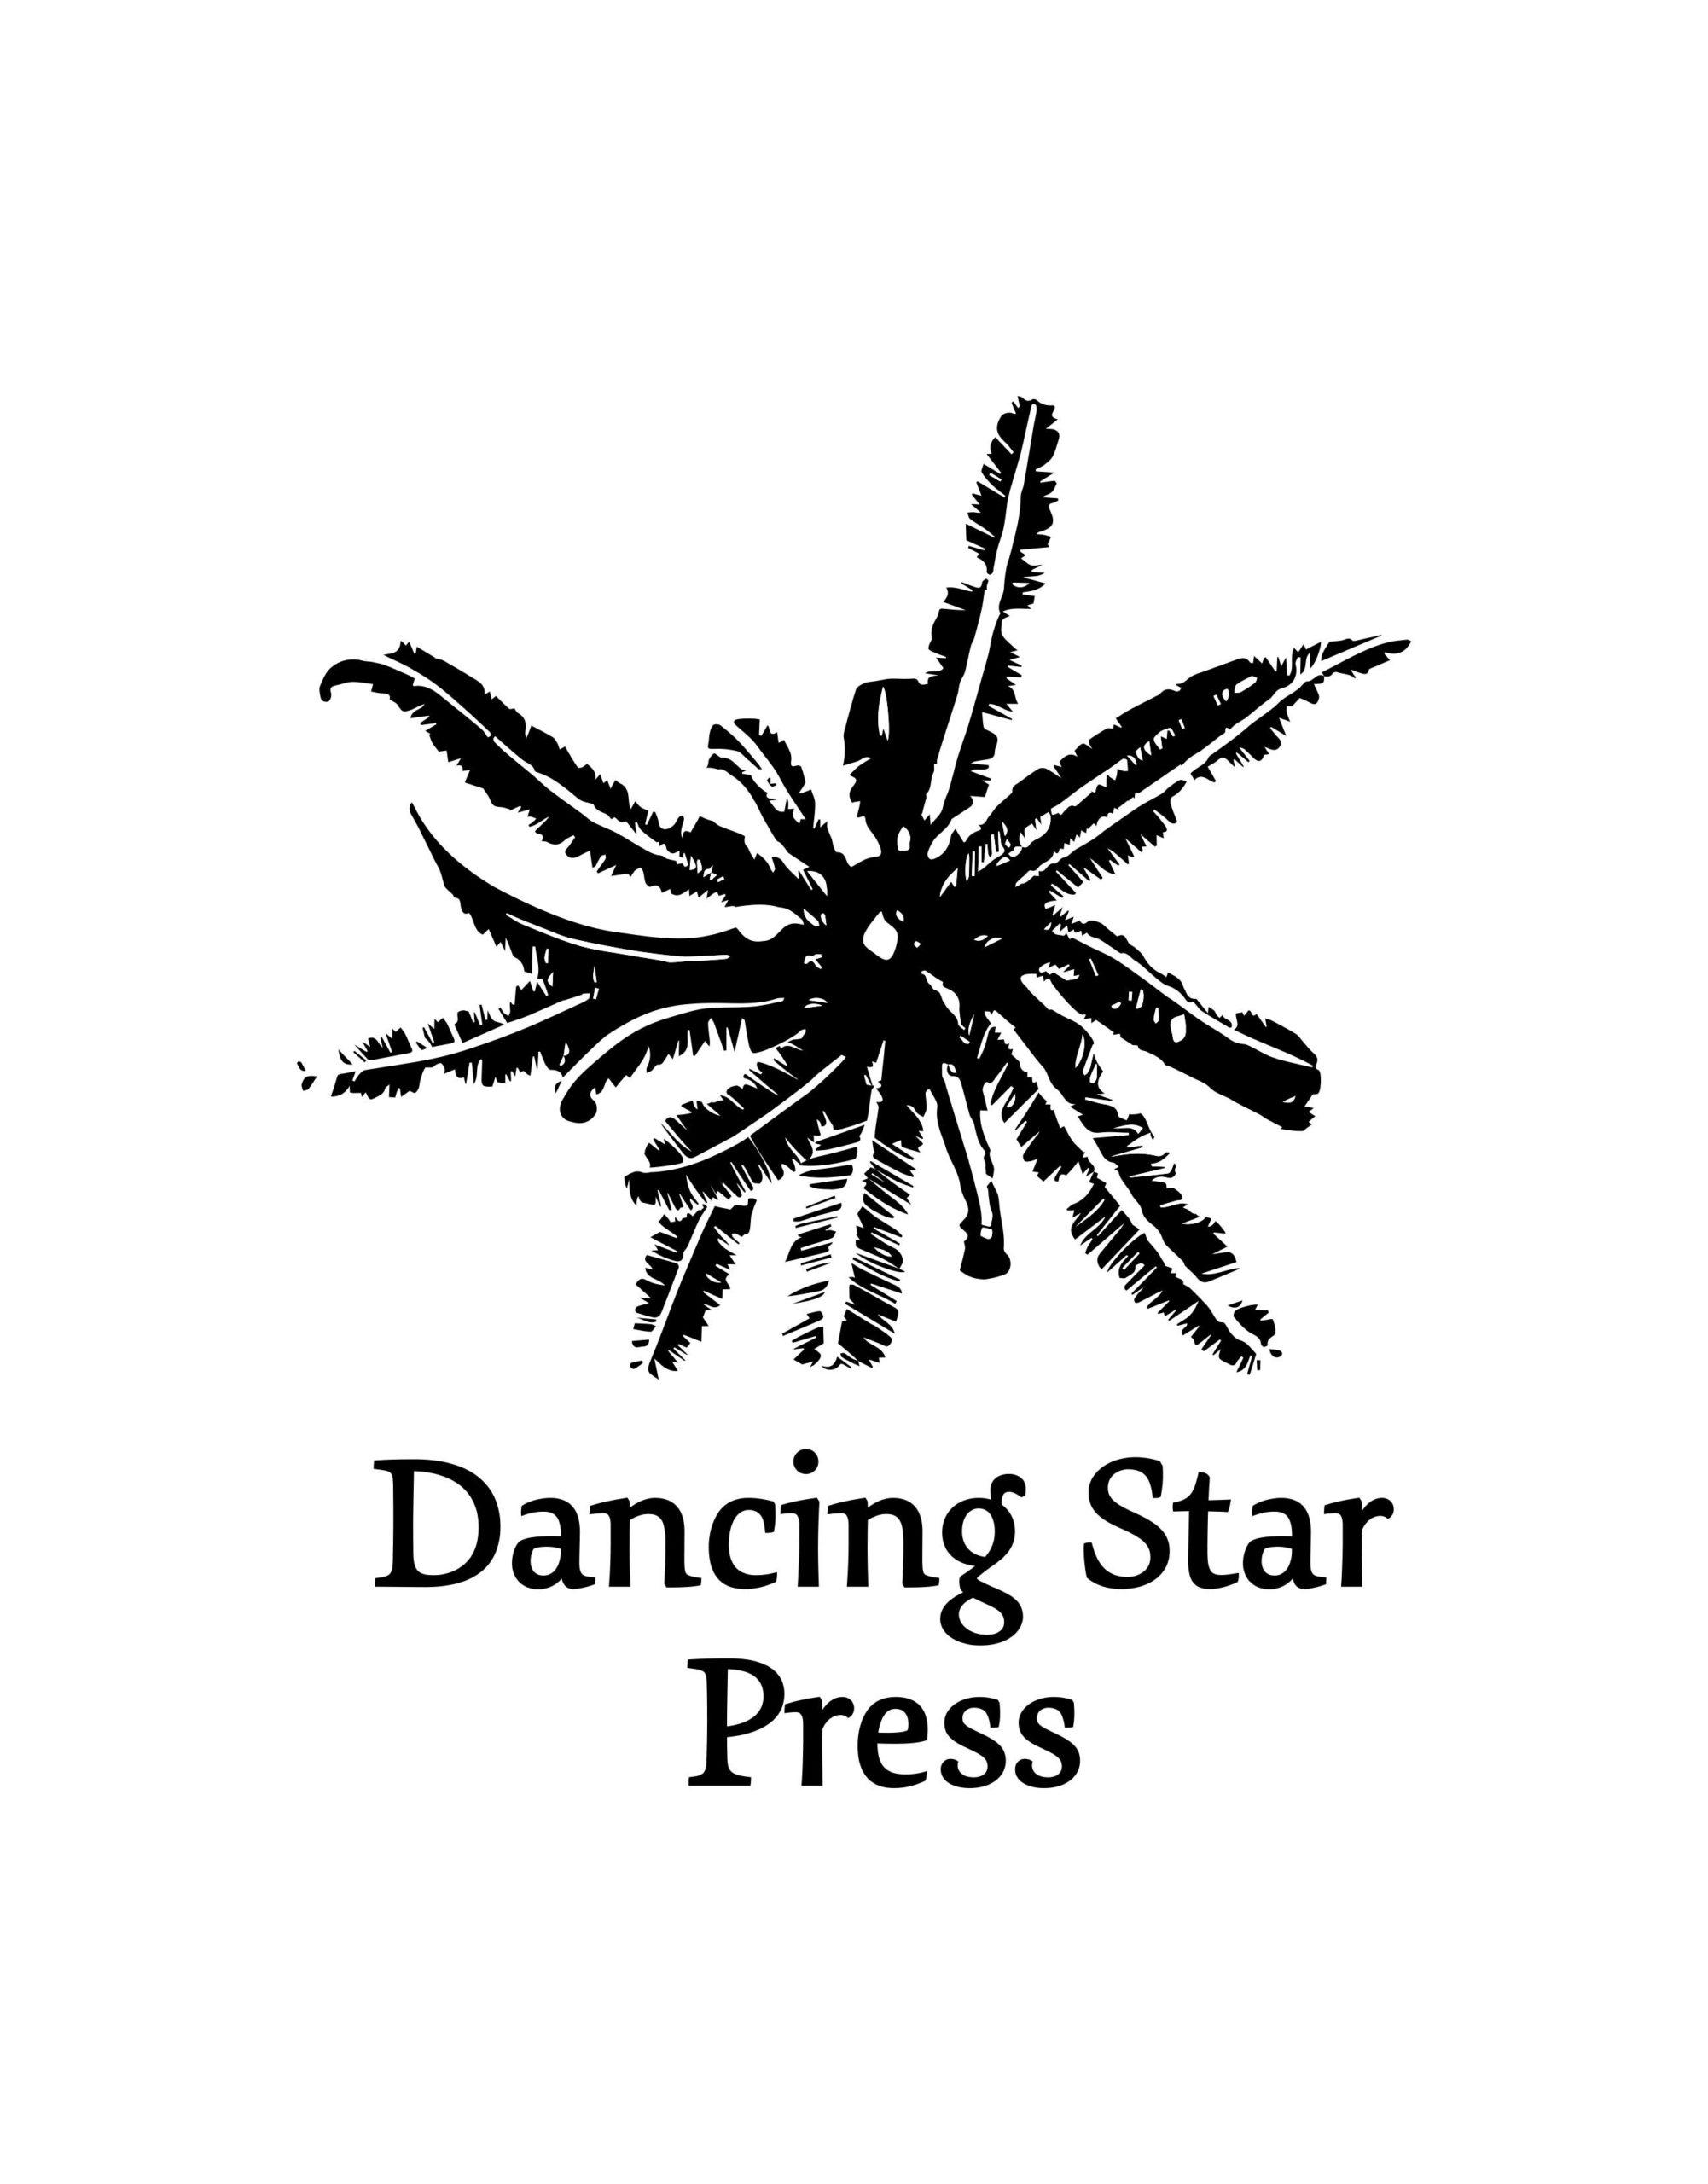 The Dancing Star Press Logo